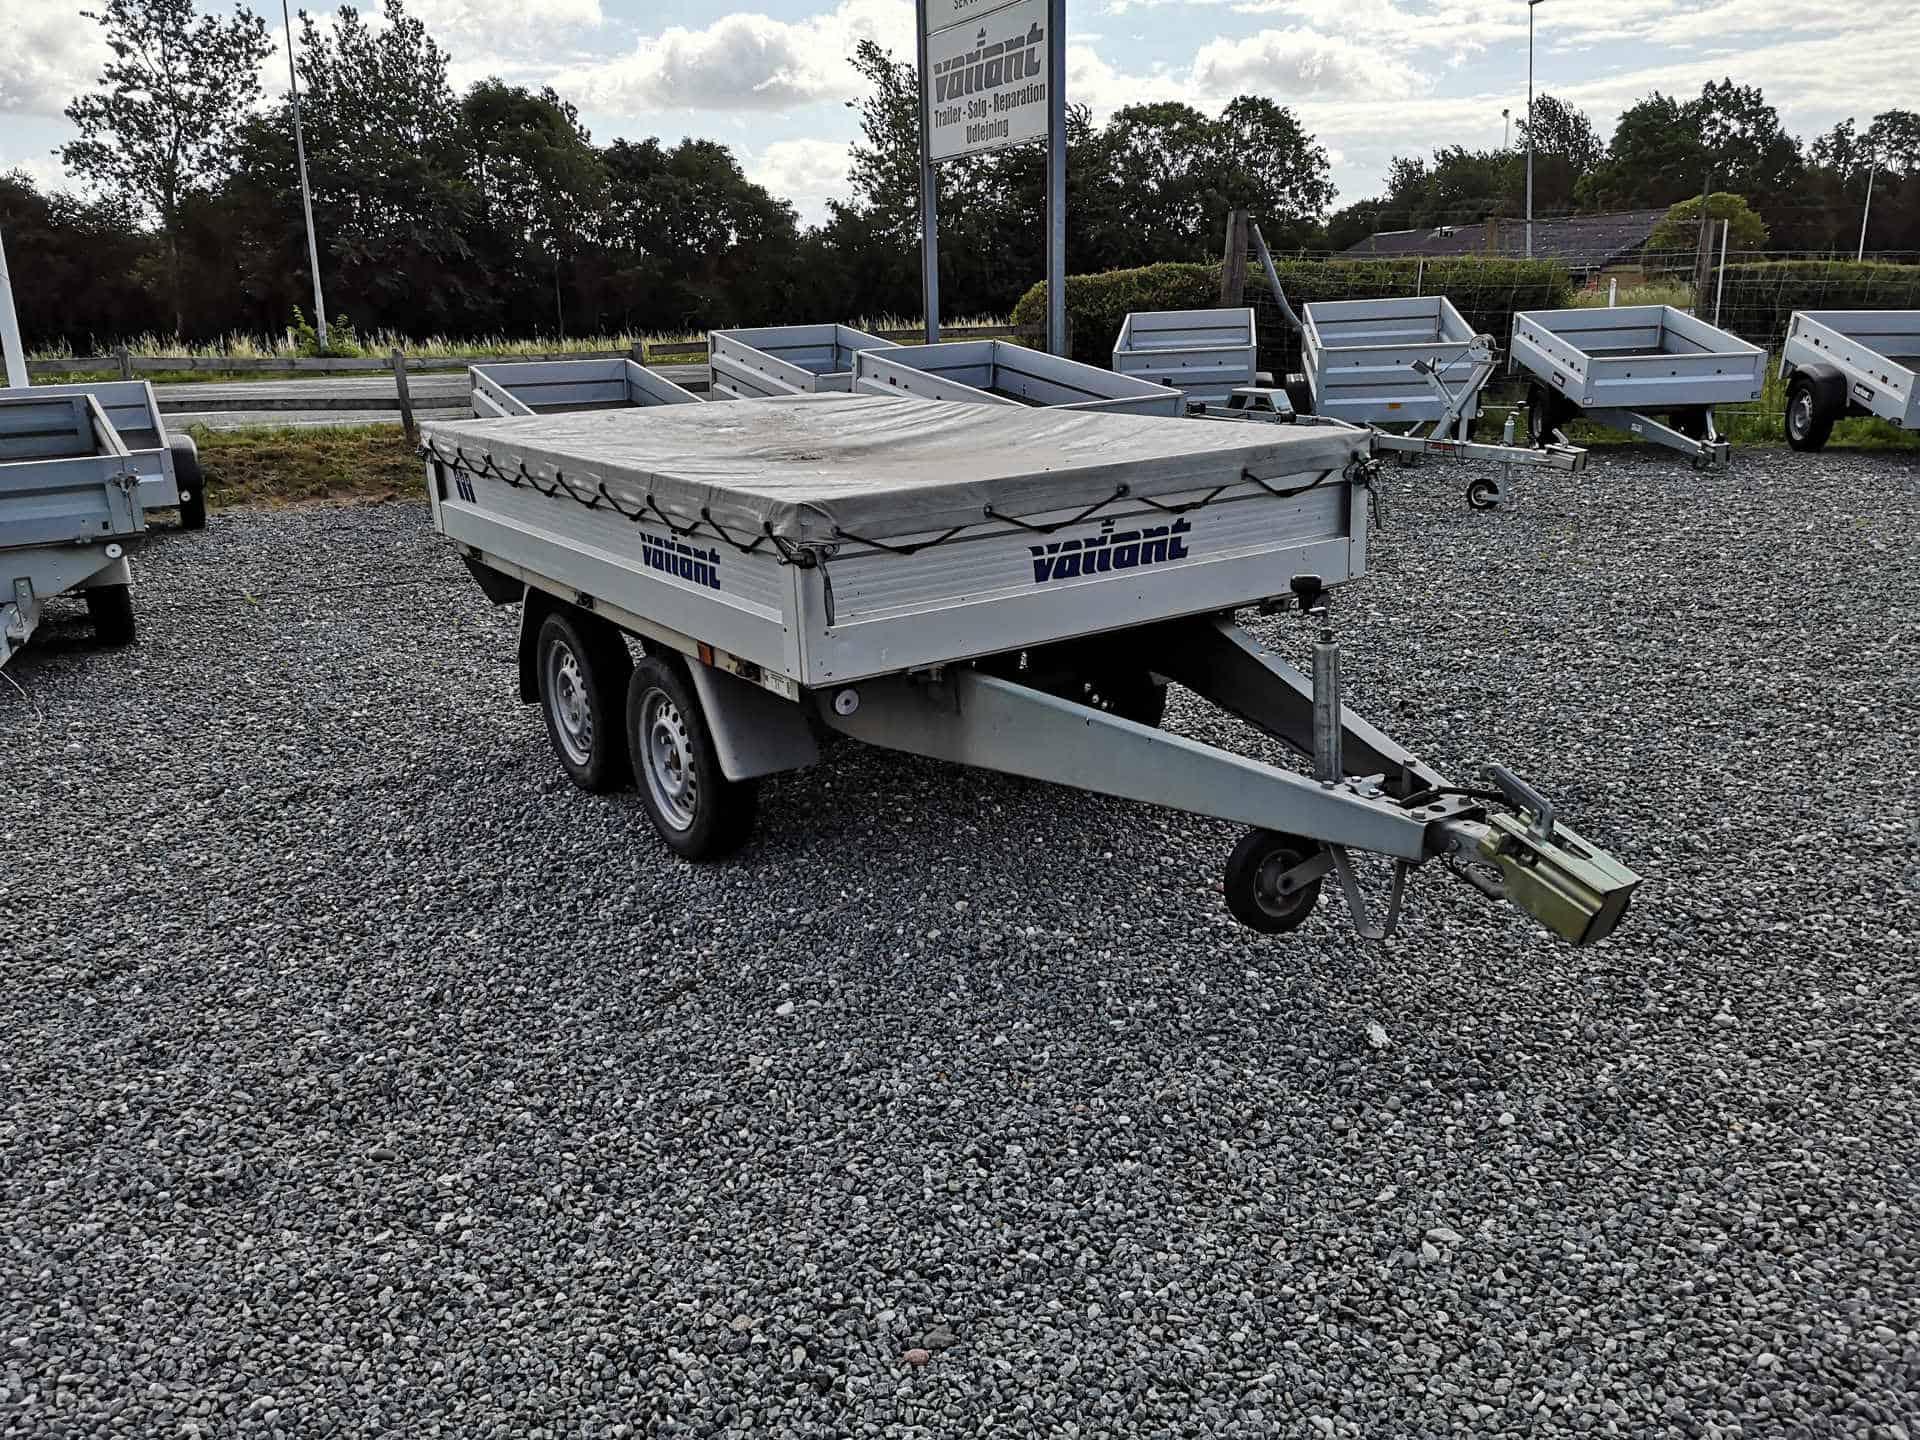 Variant 756 A Alu trailer - brugt - nysynset med 3 måneders garanti